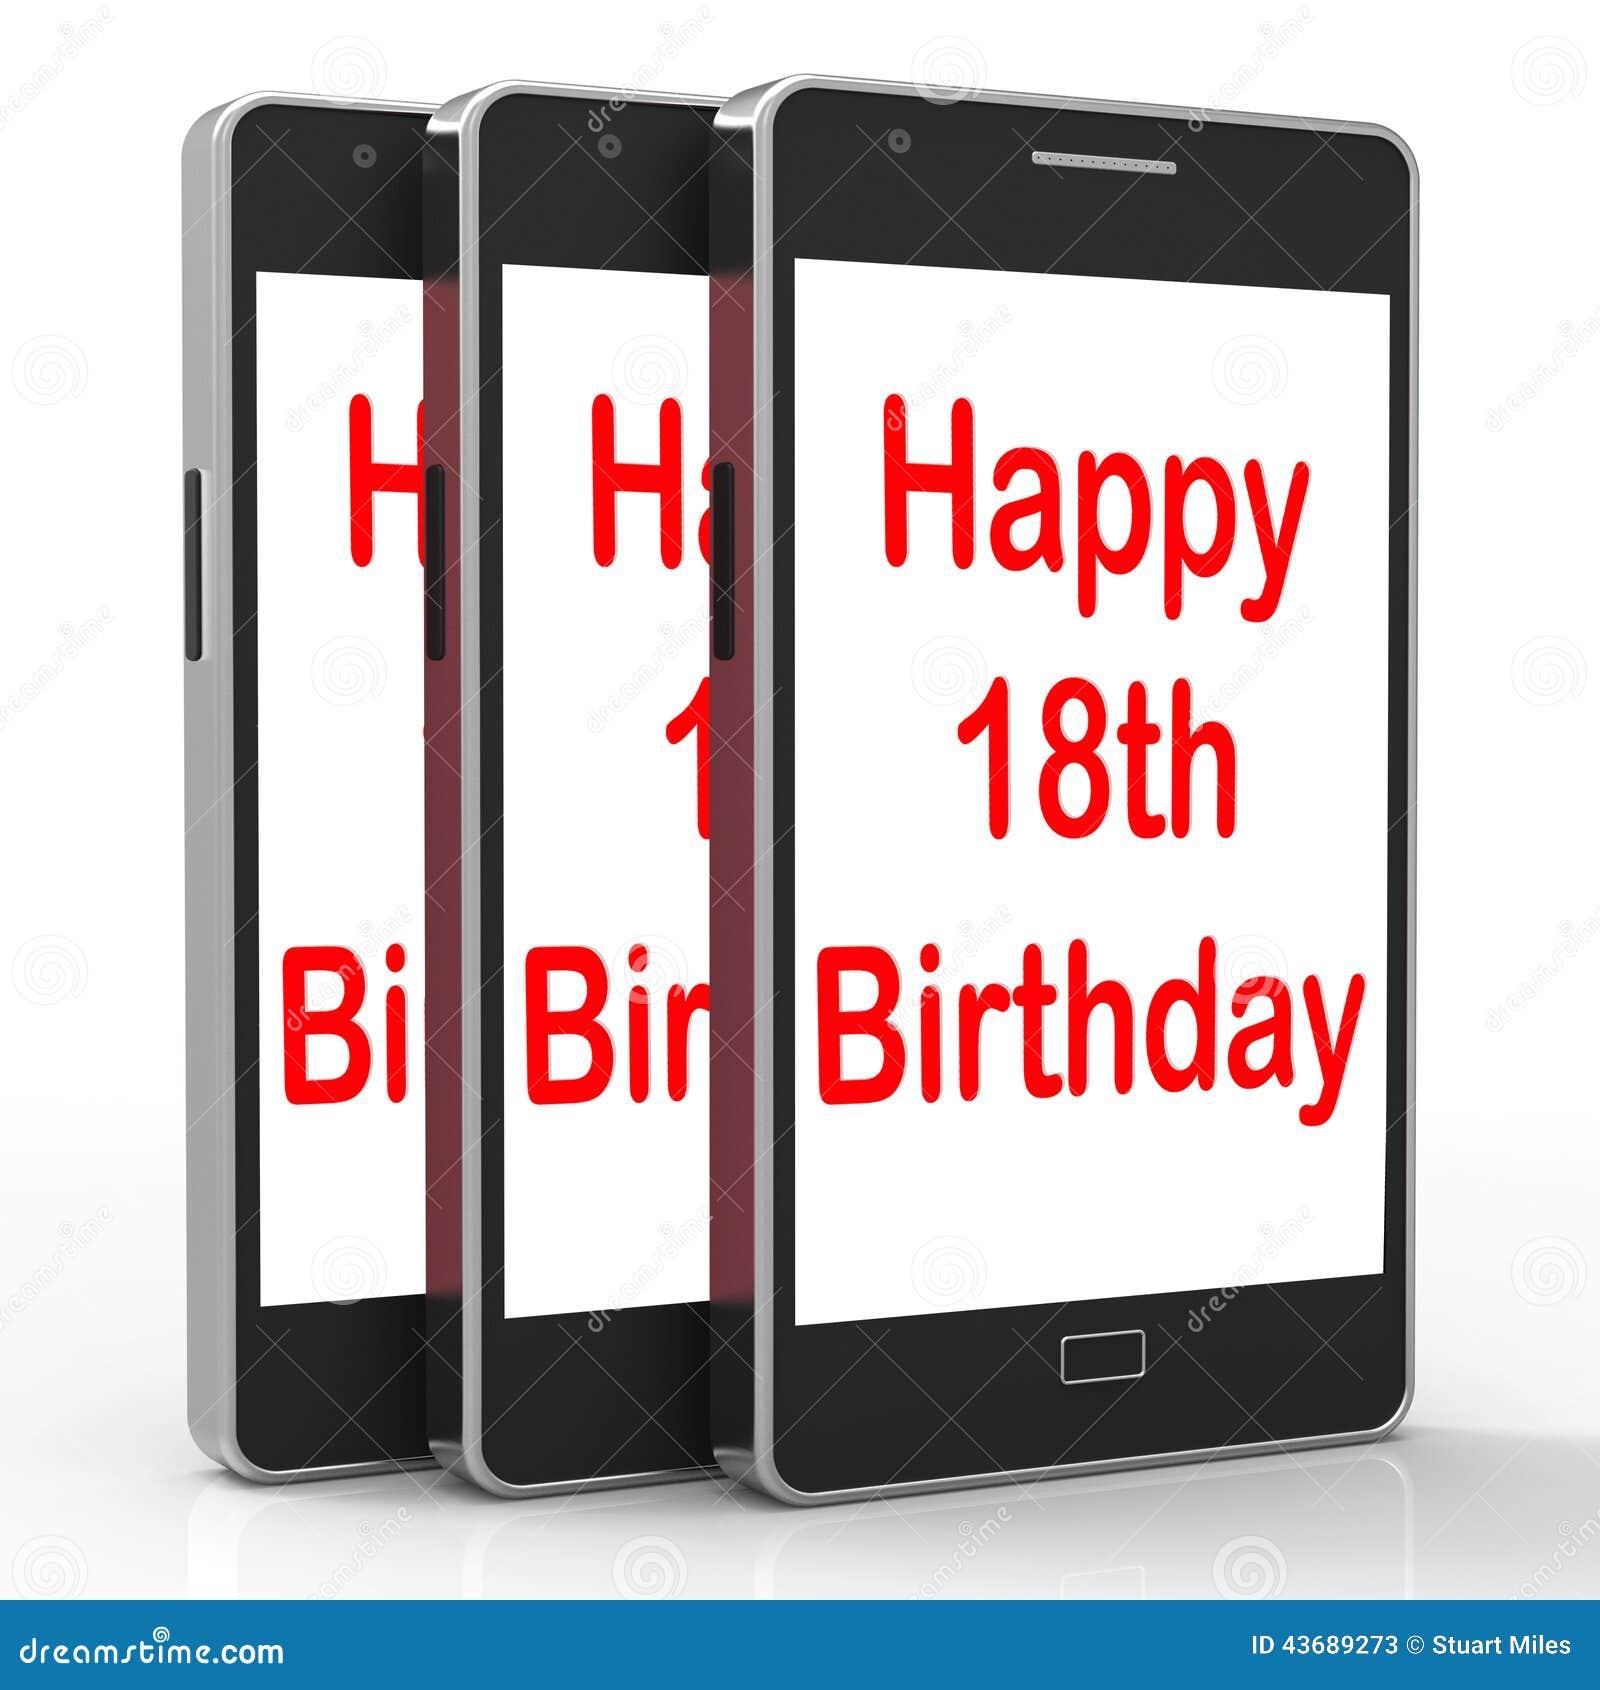 Happy 18th Birthday On Phone Means Eighteen Stock Illustration